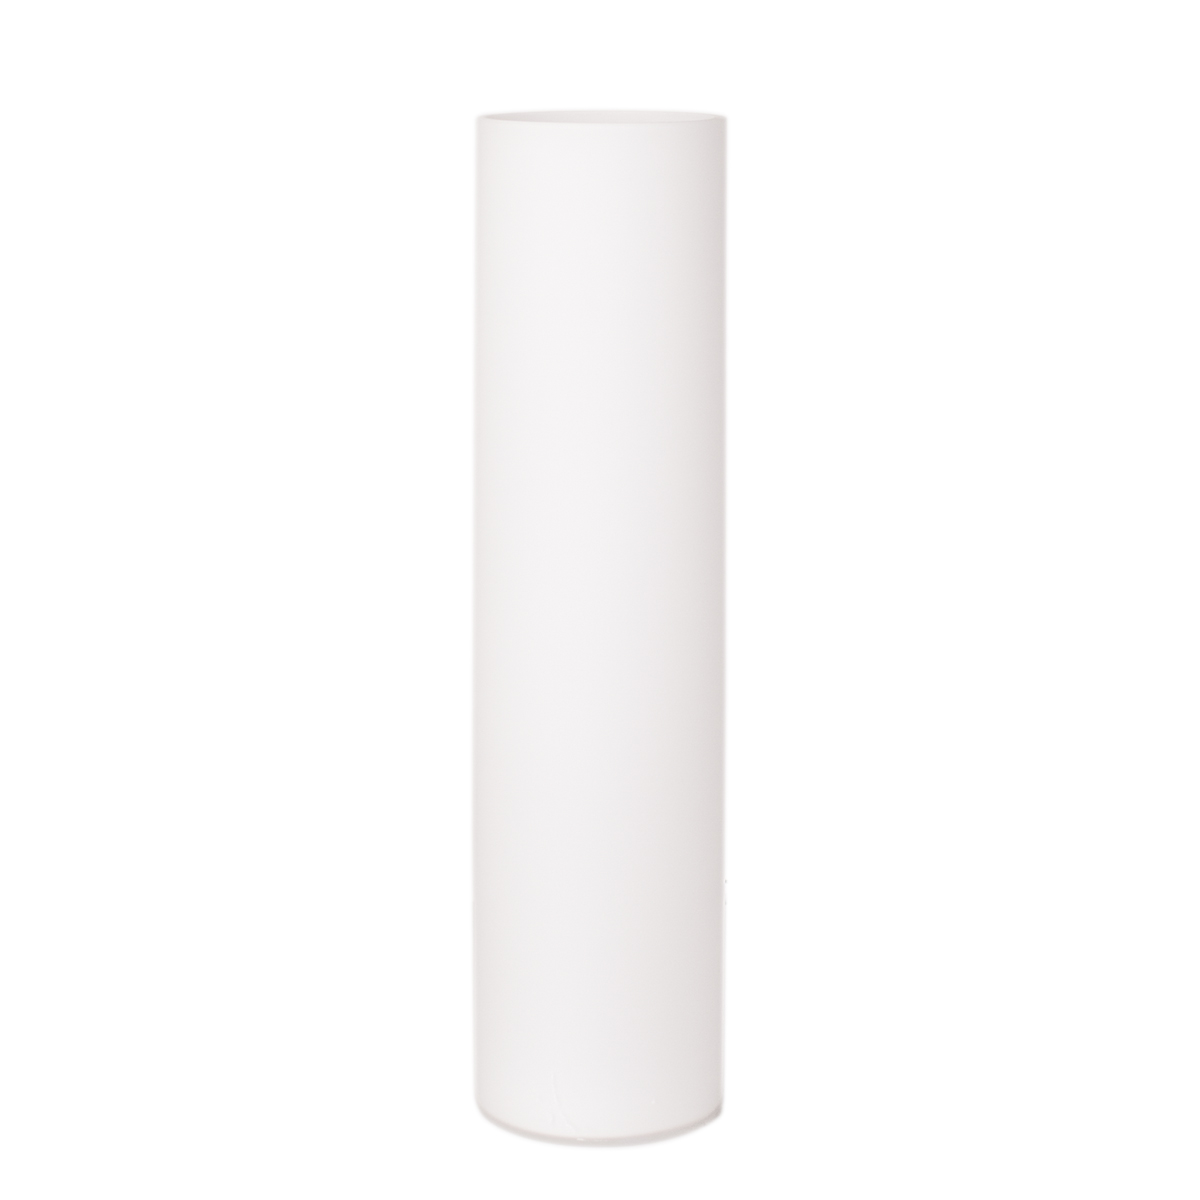 By Rydens Flake Bordlampe H30 cm Hvit Matt